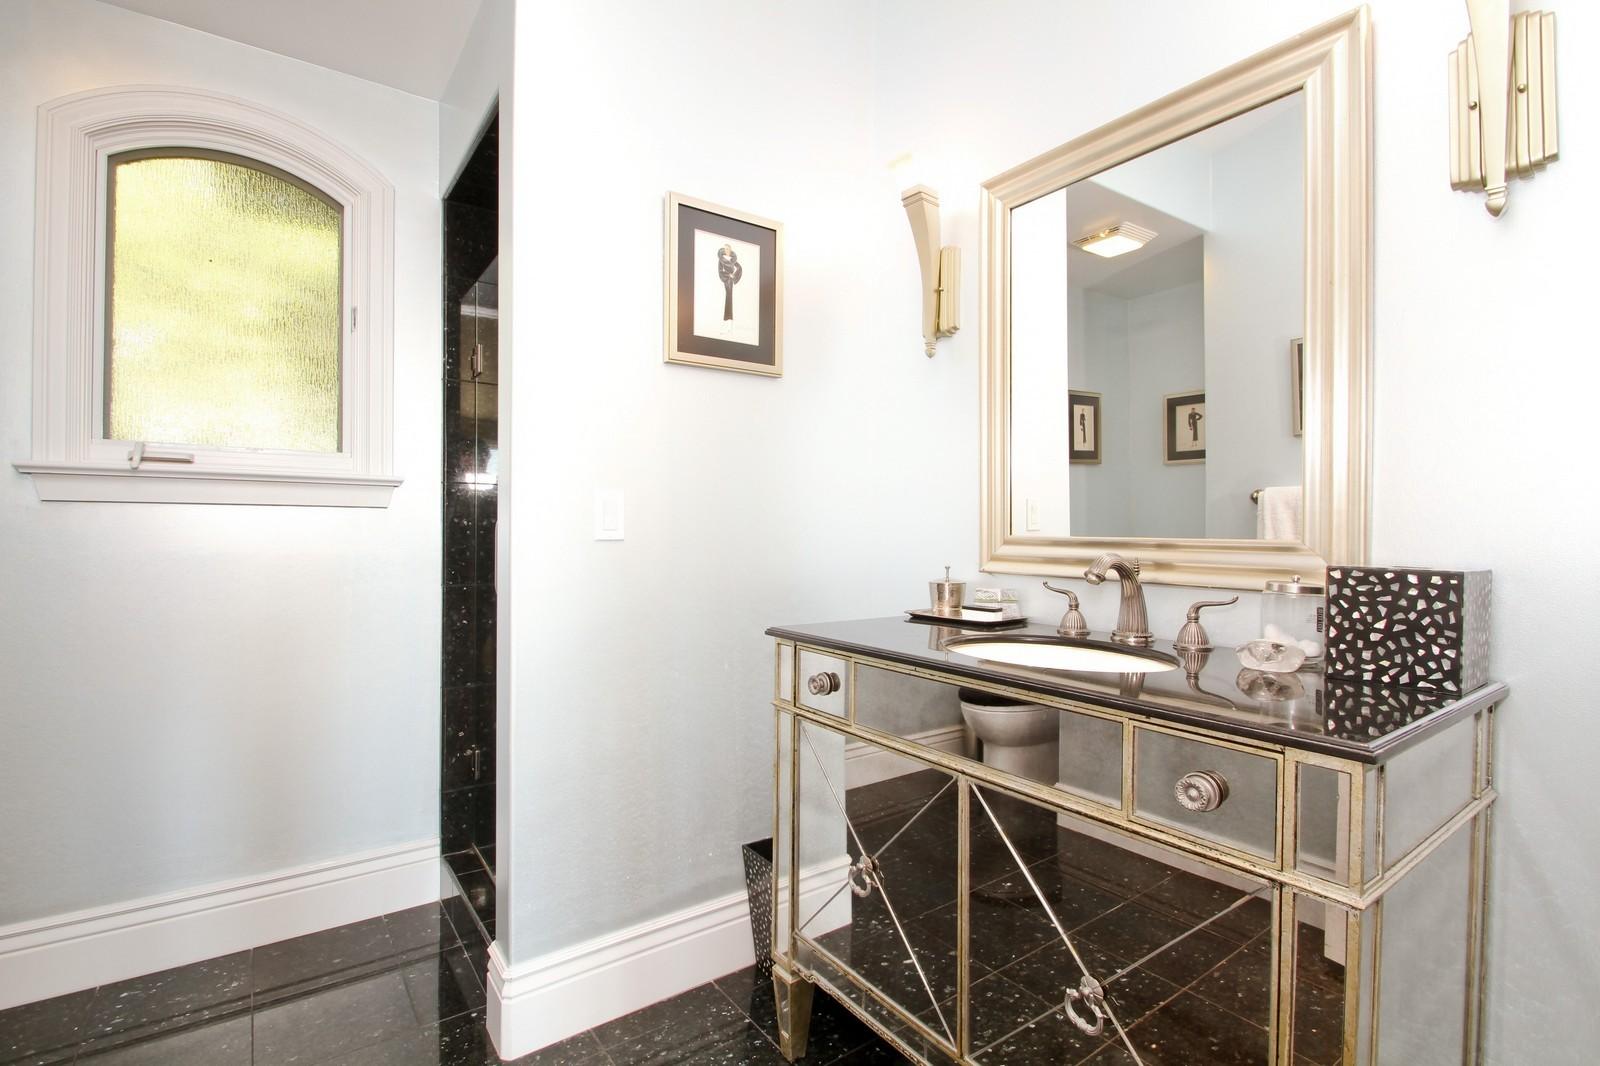 Real Estate Photography - 73 Upper Toyon Drive, Kentfield, CA, 94904 - Bathroom